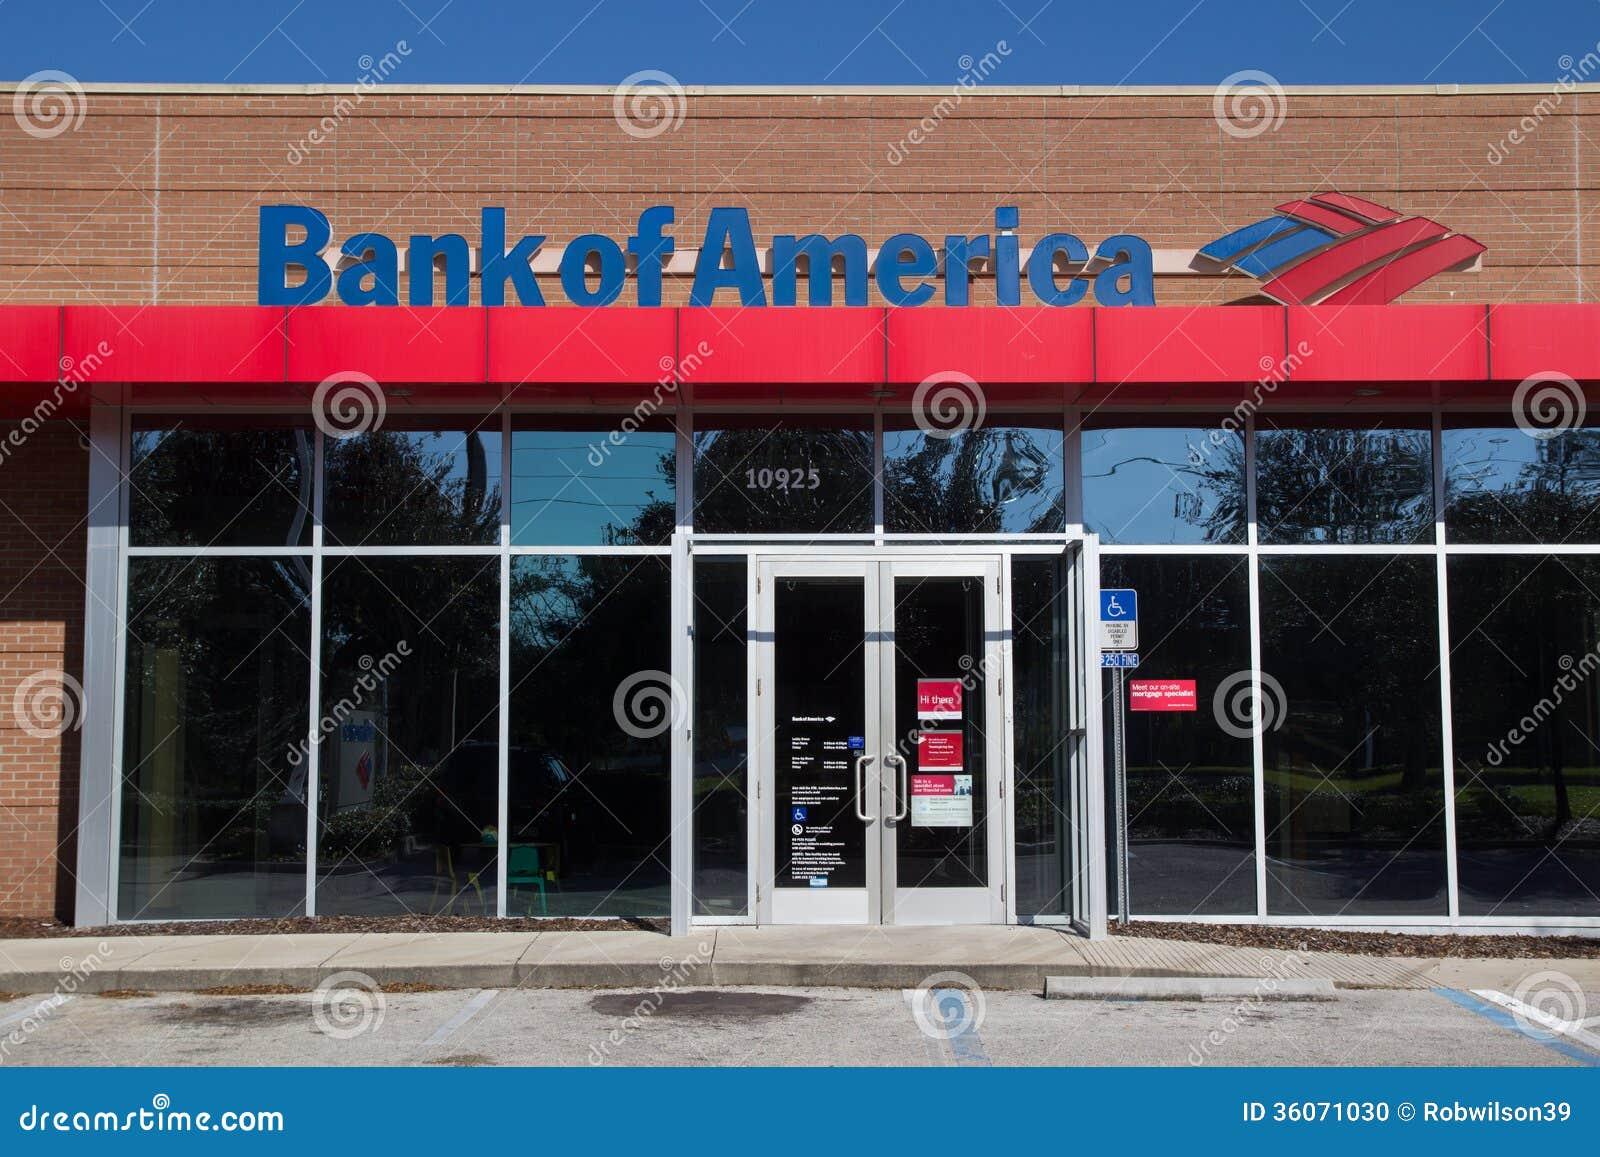 Bank Of America Stock Photo 36071030 Megapixl